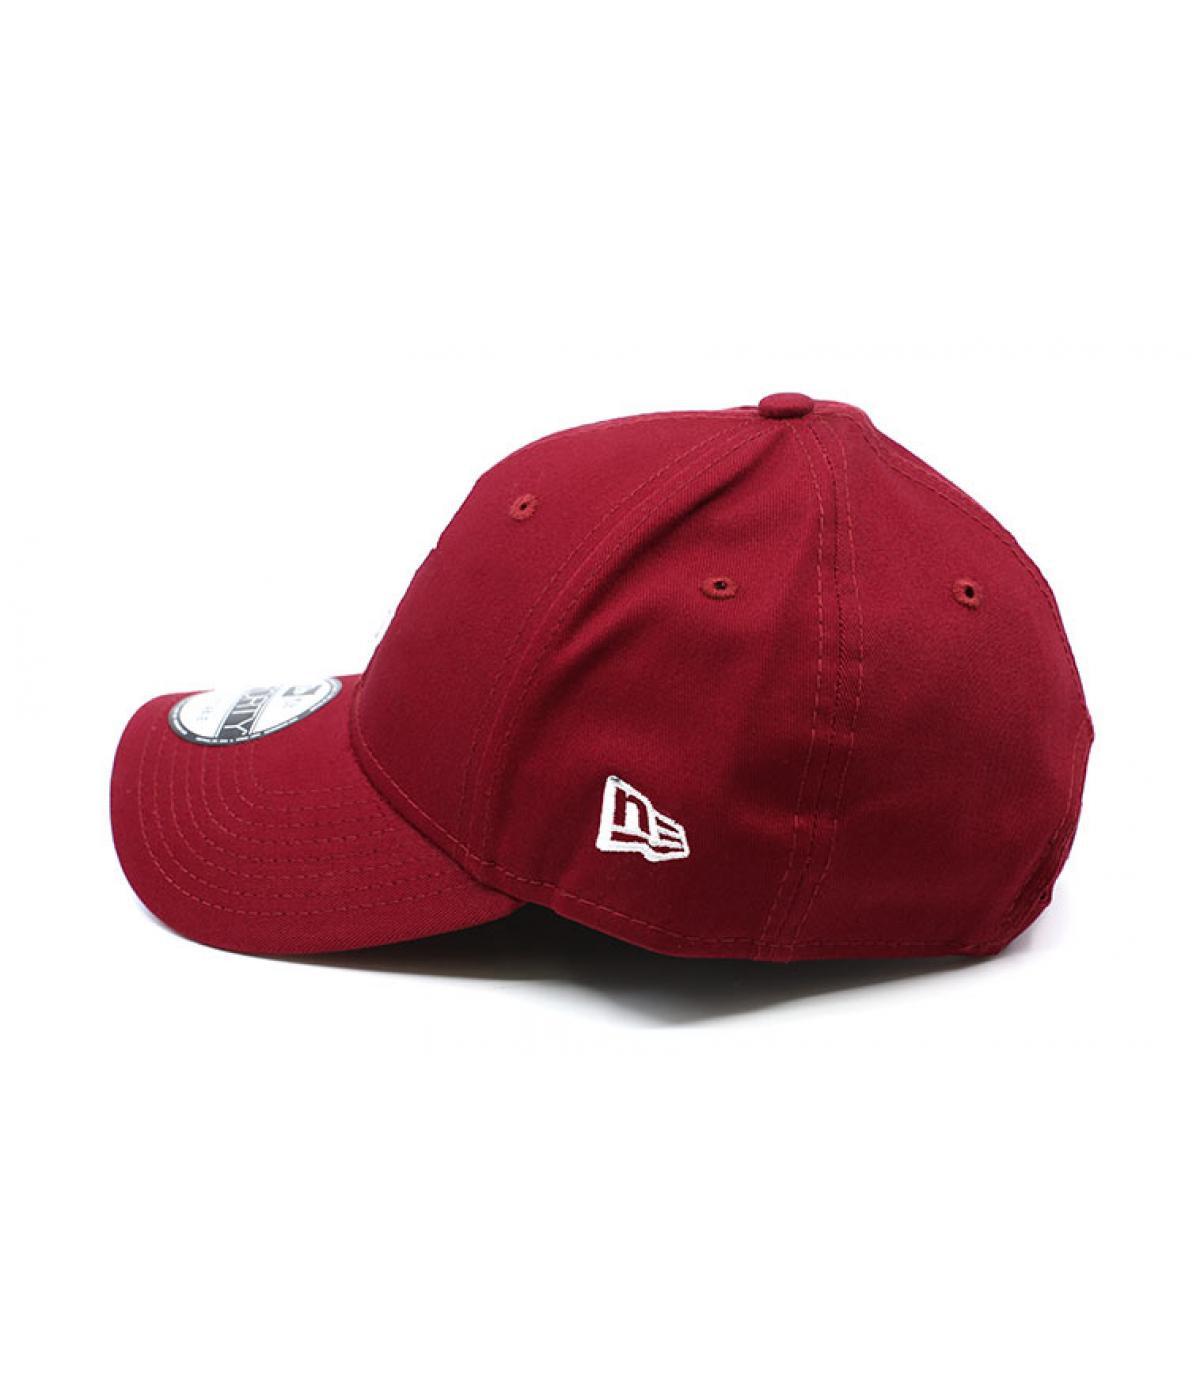 Details League Ess 9Forty Boston cardinal - afbeeling 4